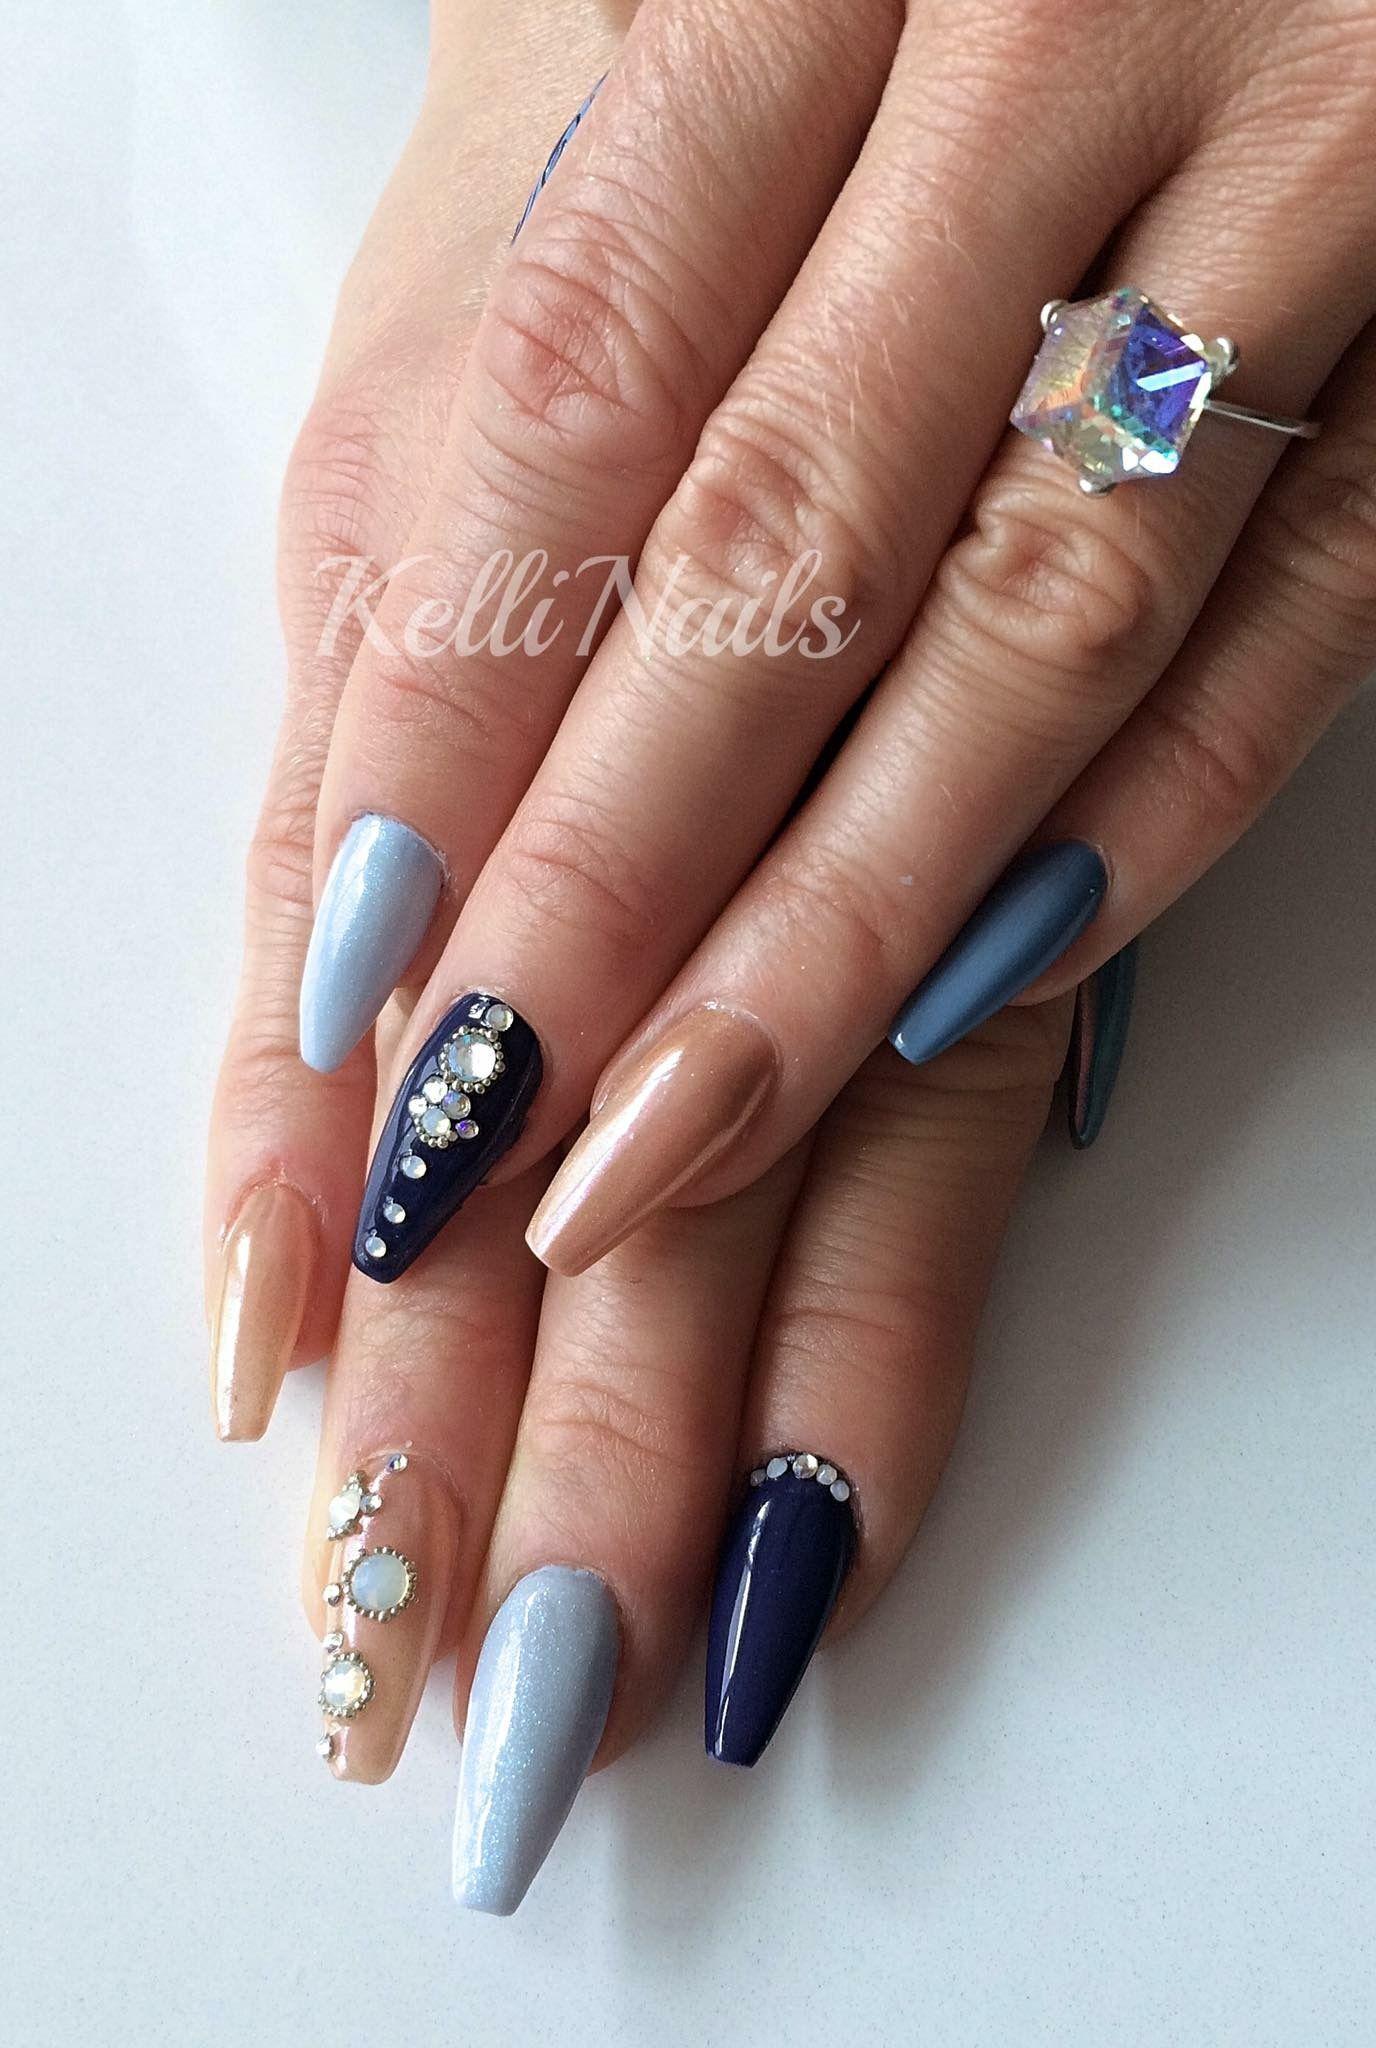 coffin nails ballerina n gel in dunkel und hell blau modern n gel nailart nageldesign. Black Bedroom Furniture Sets. Home Design Ideas